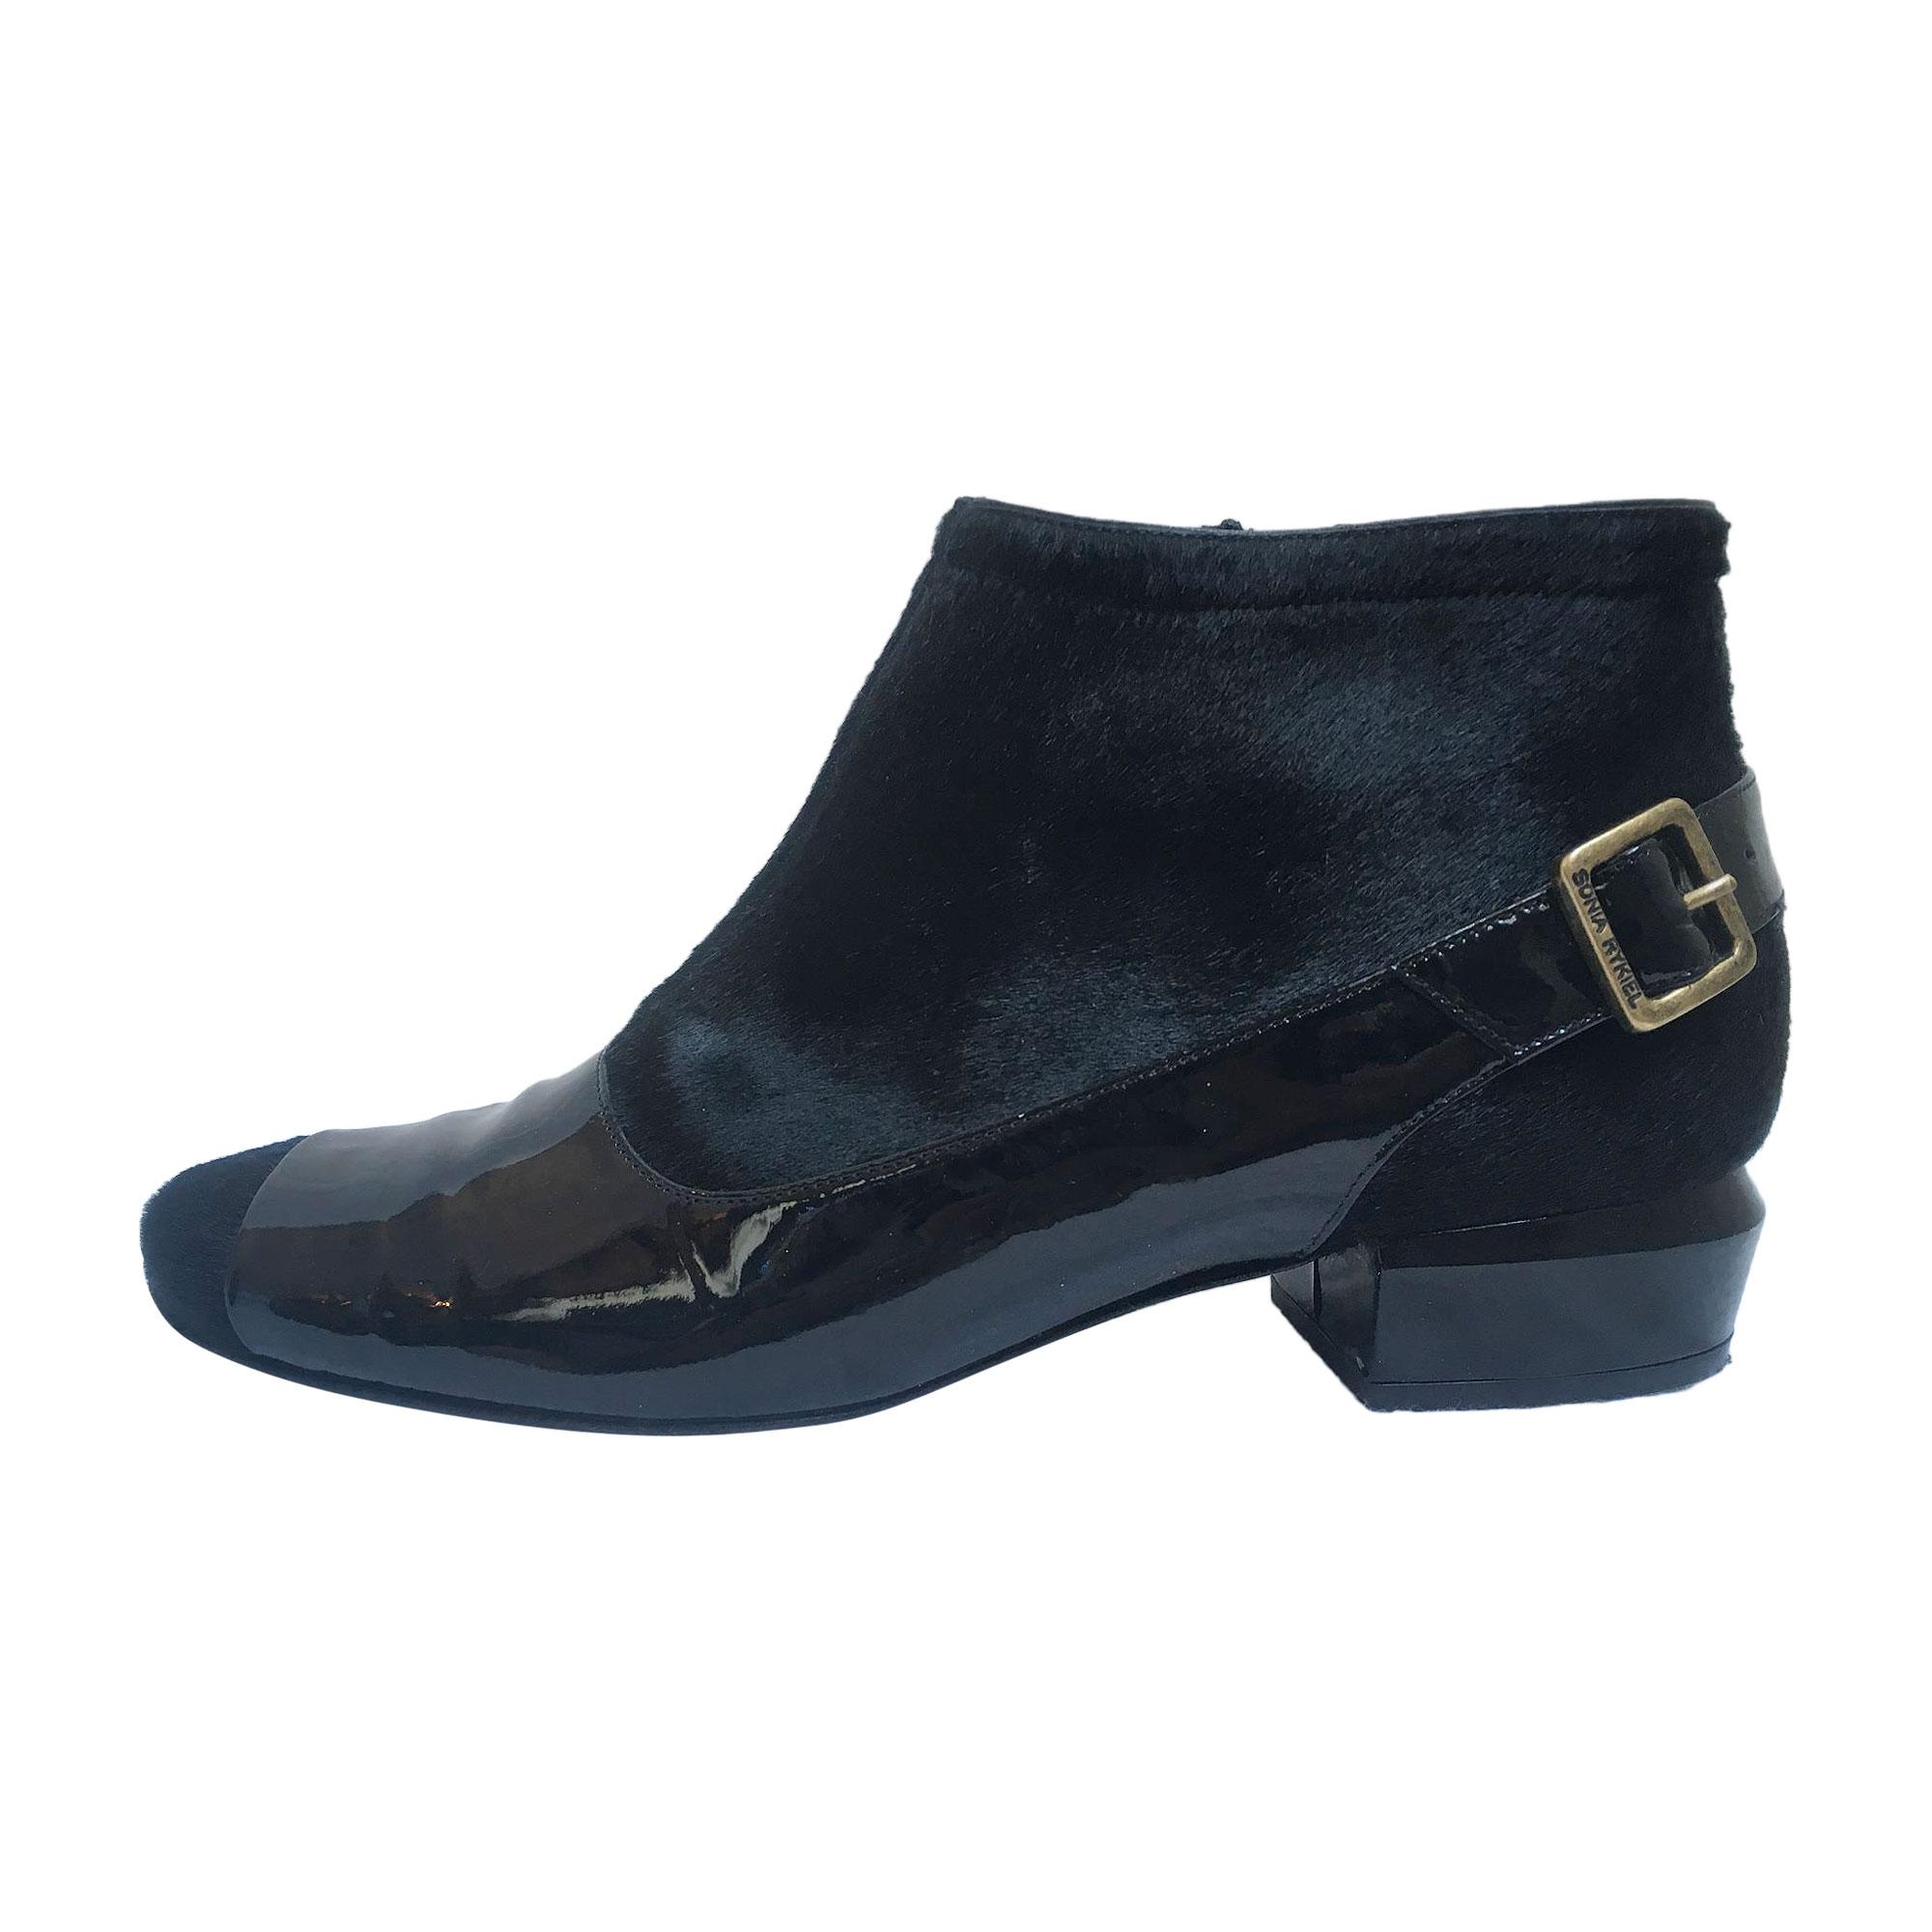 Bottines & low boots à talons SONIA RYKIEL Noir